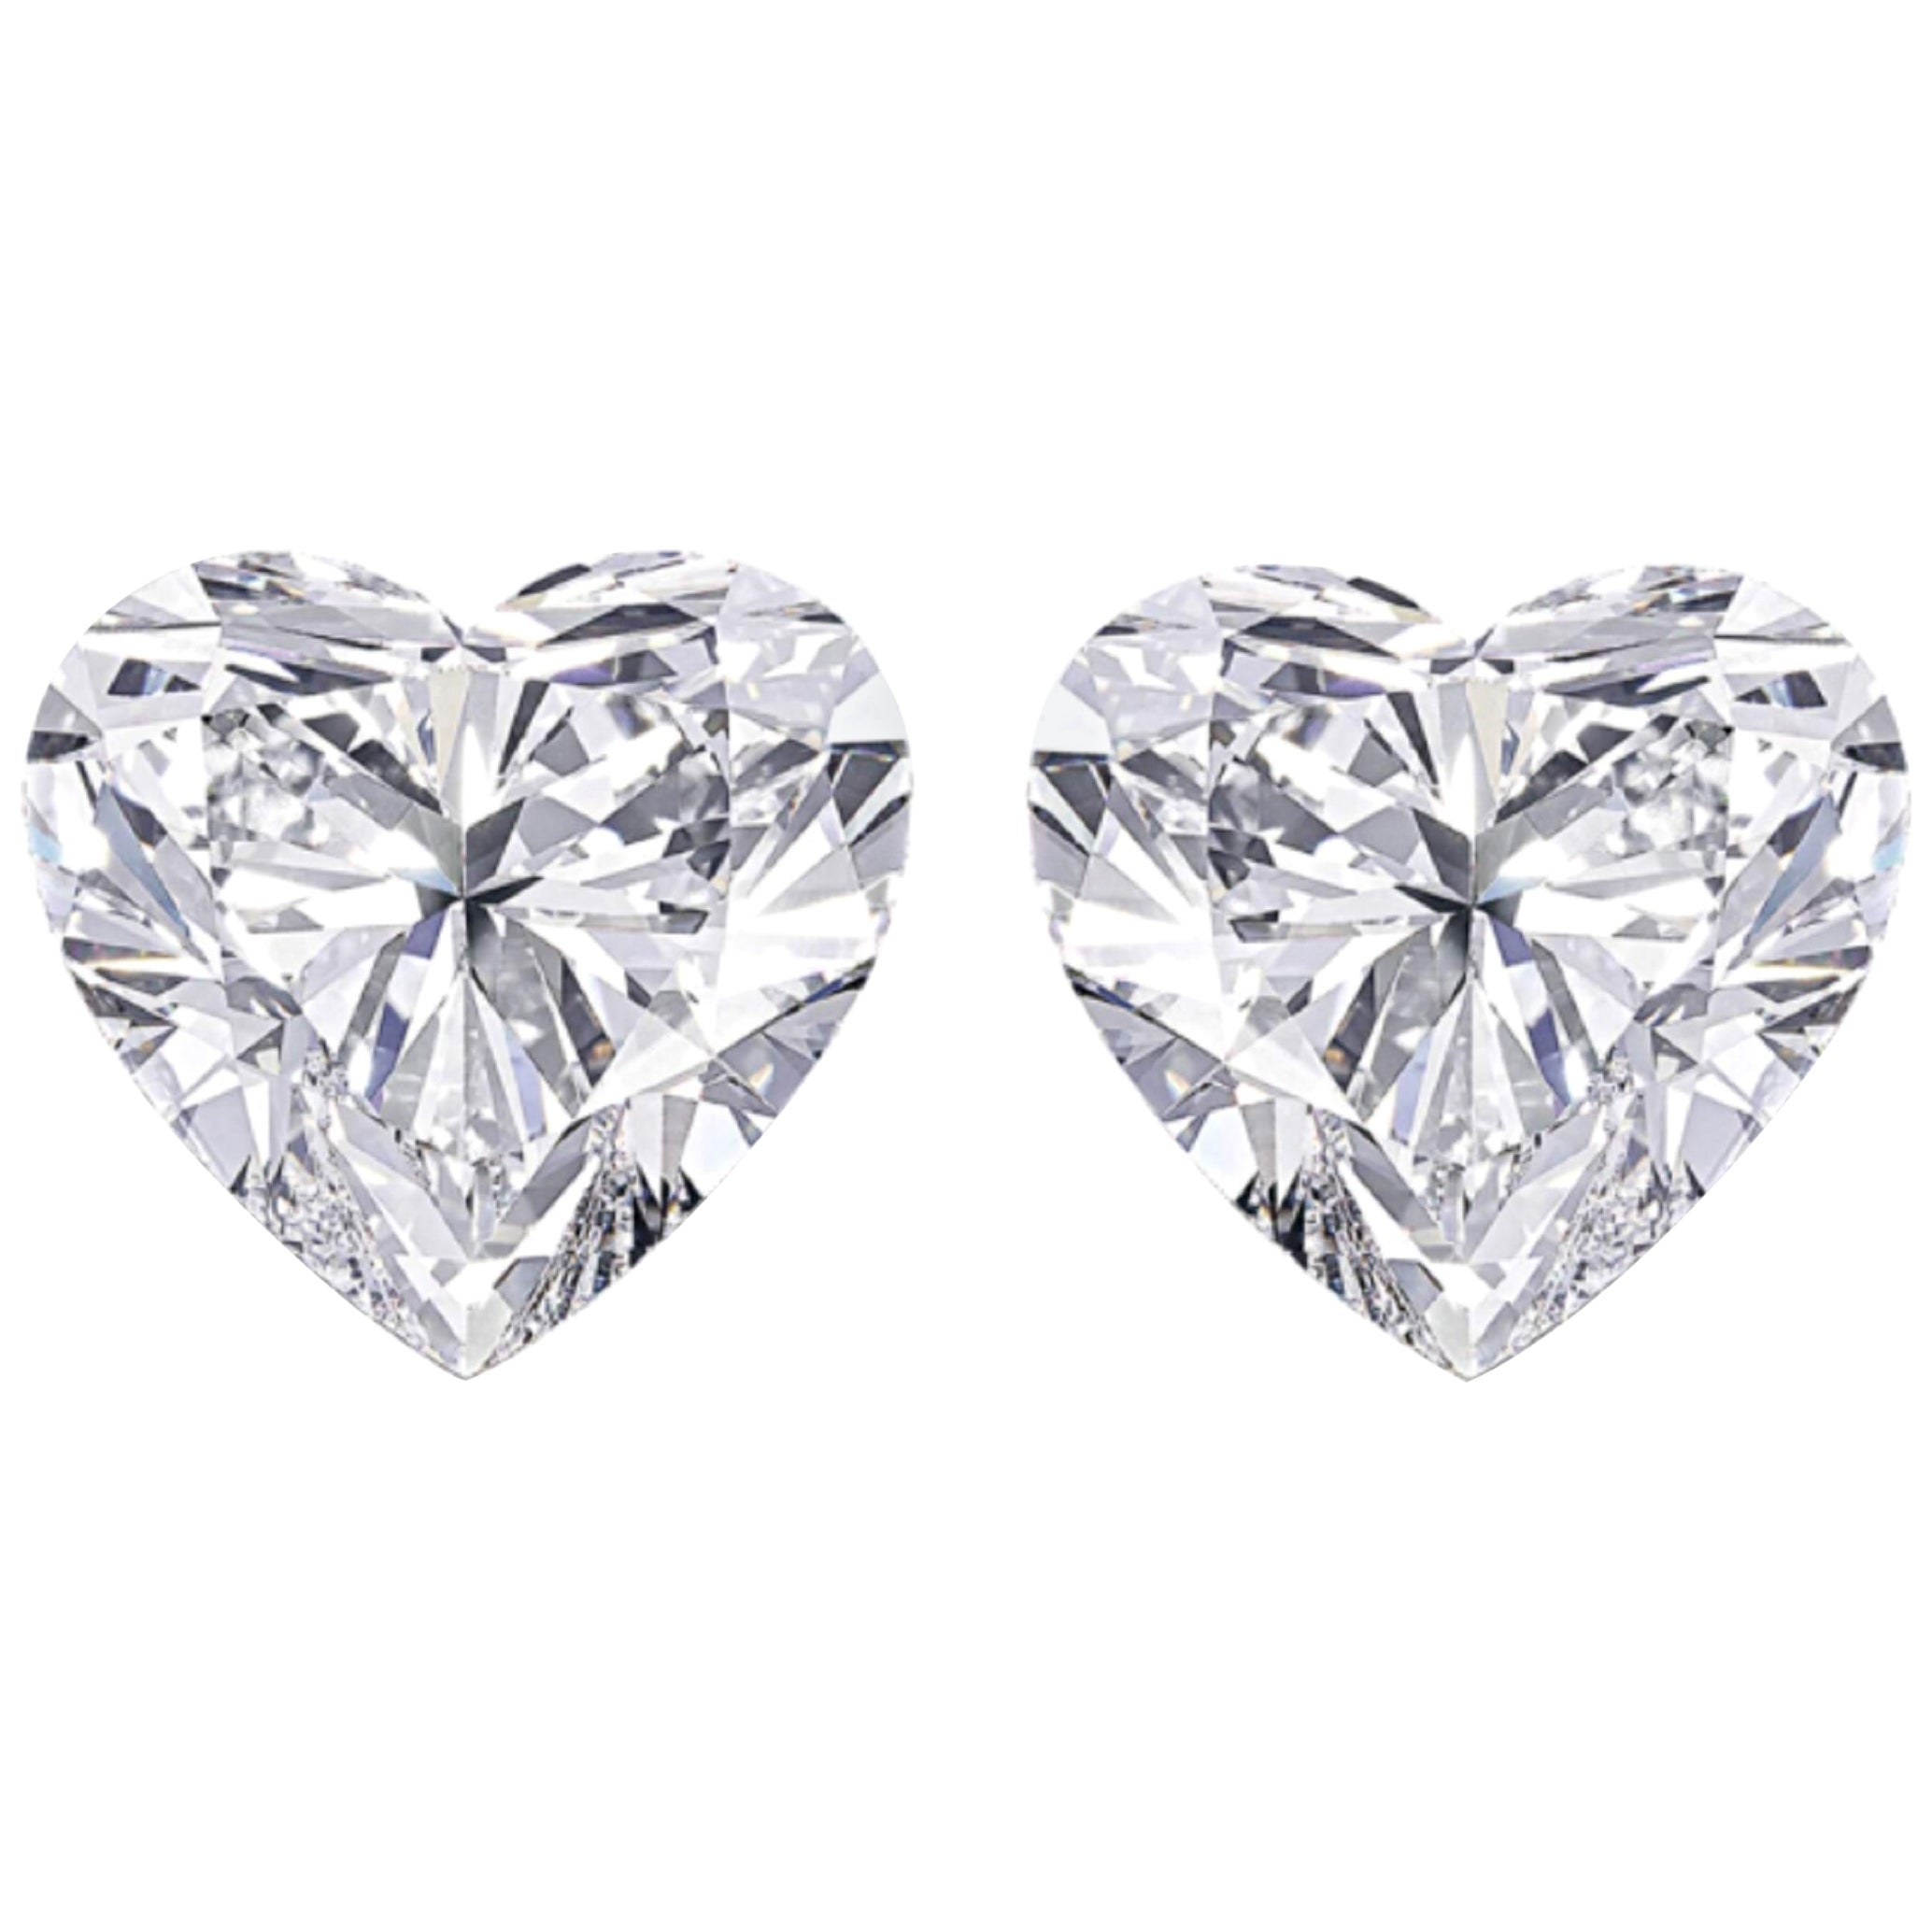 Internally Flawless D/E Color Heart Shape Diamond 3.01 Carat Studs